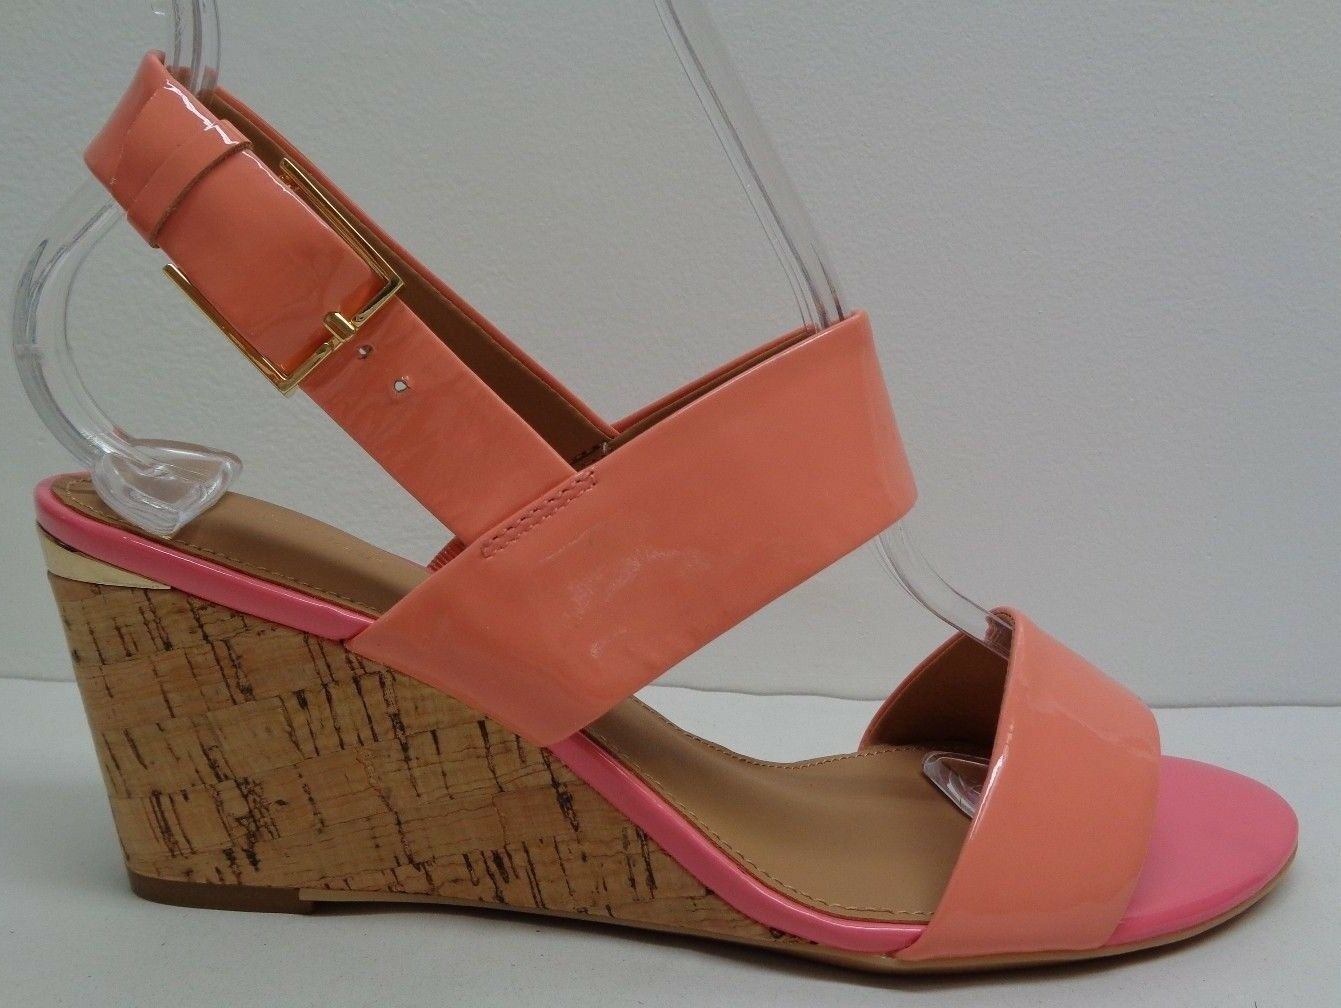 Calvin Klein Größe 7 M PEARLA Coral Patent Leder Wedge Sandales NEU Damenschuhe Schuhes